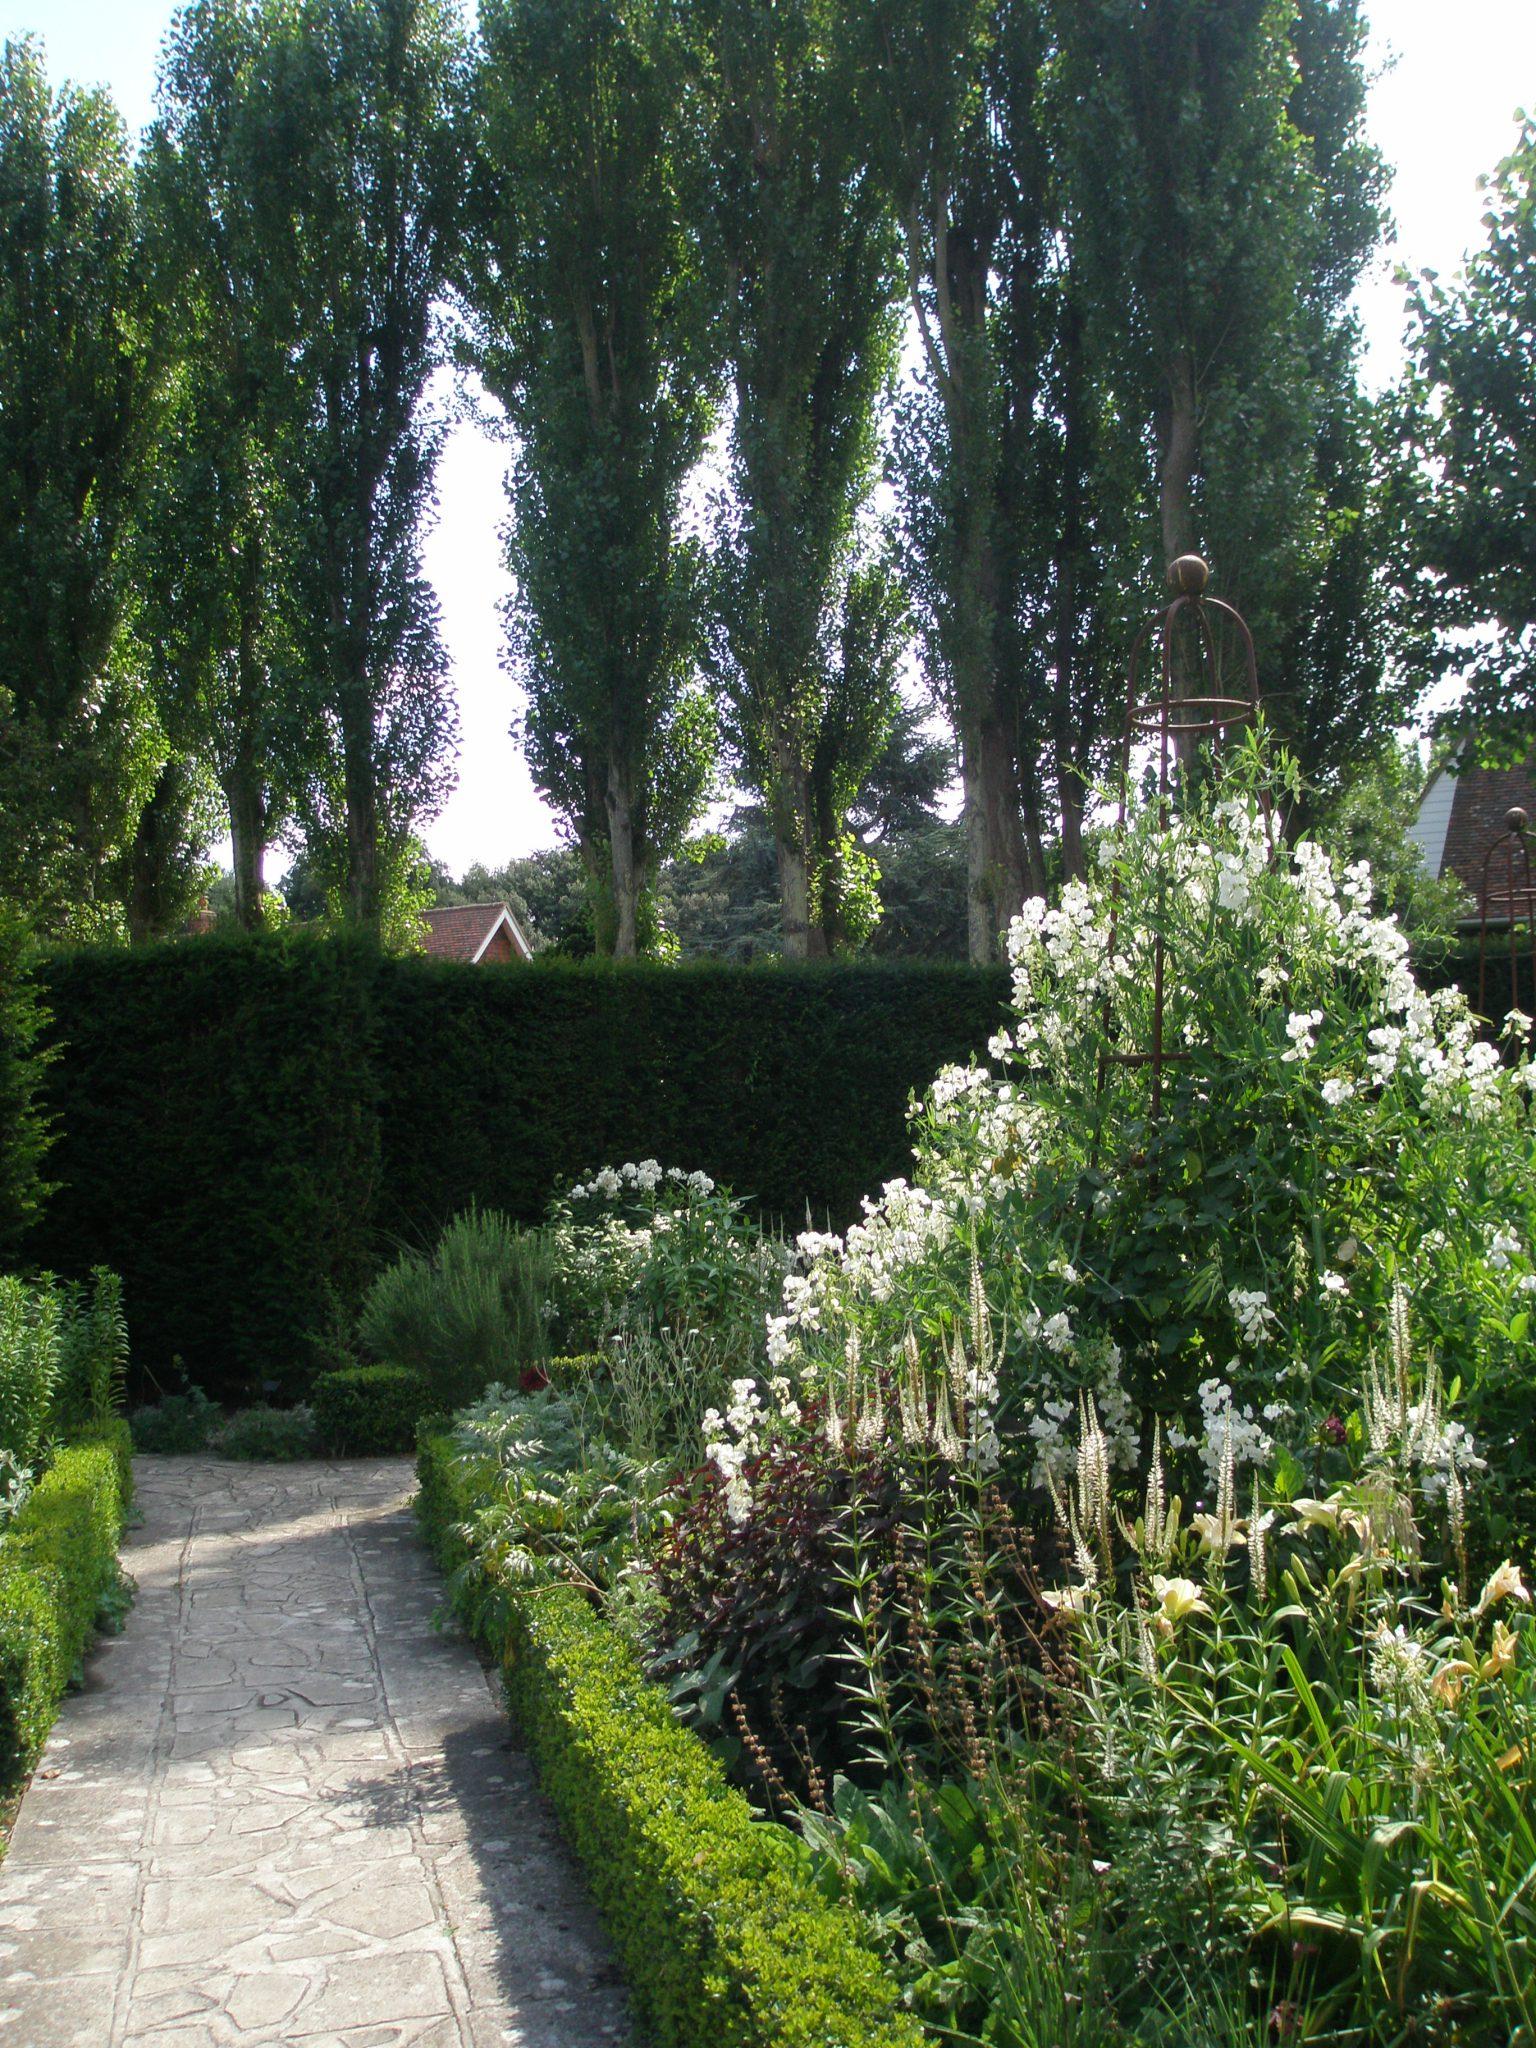 Looking toward the Poplar Walk, from the White Garden